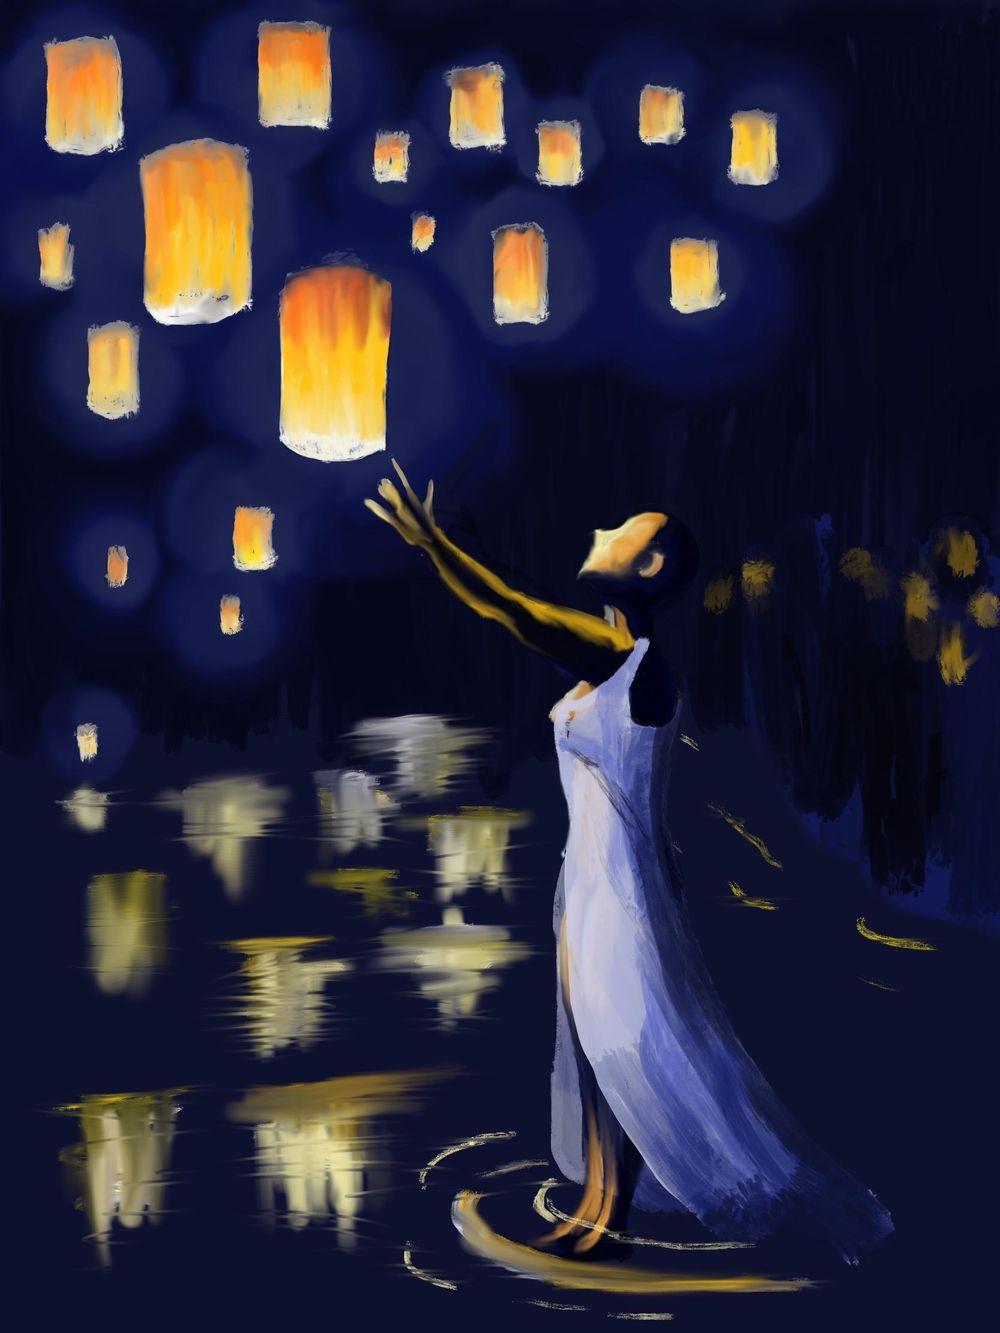 Lanterns - image 1 - student project